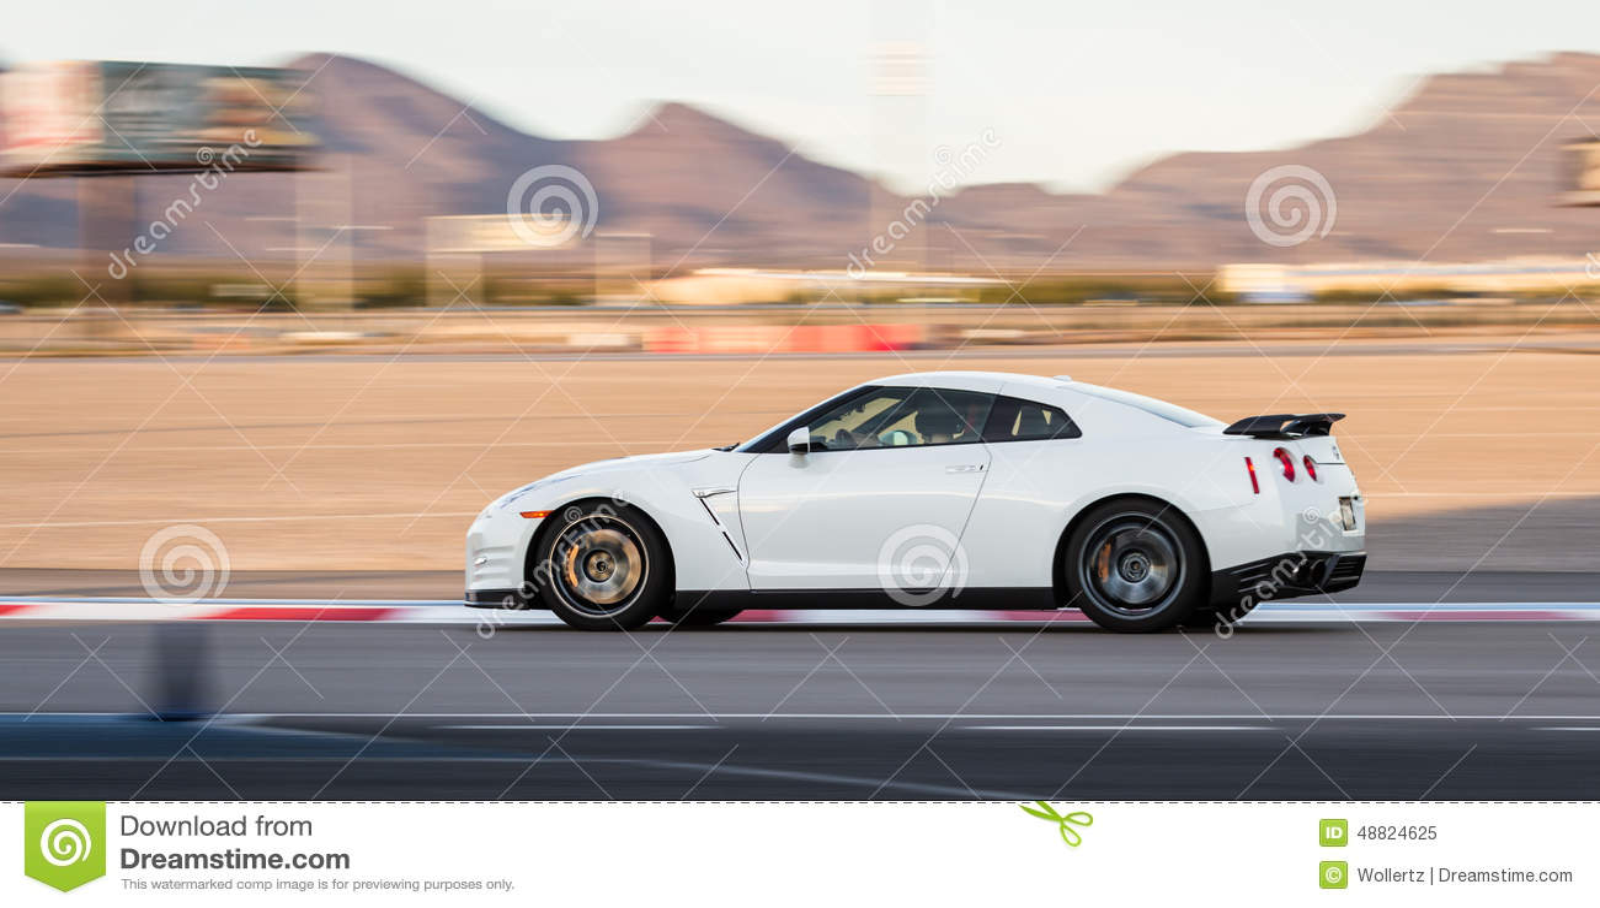 Nissan Las Vegas Nevada U003eu003e Nissan GTR Editorial Image   Image: 48824625